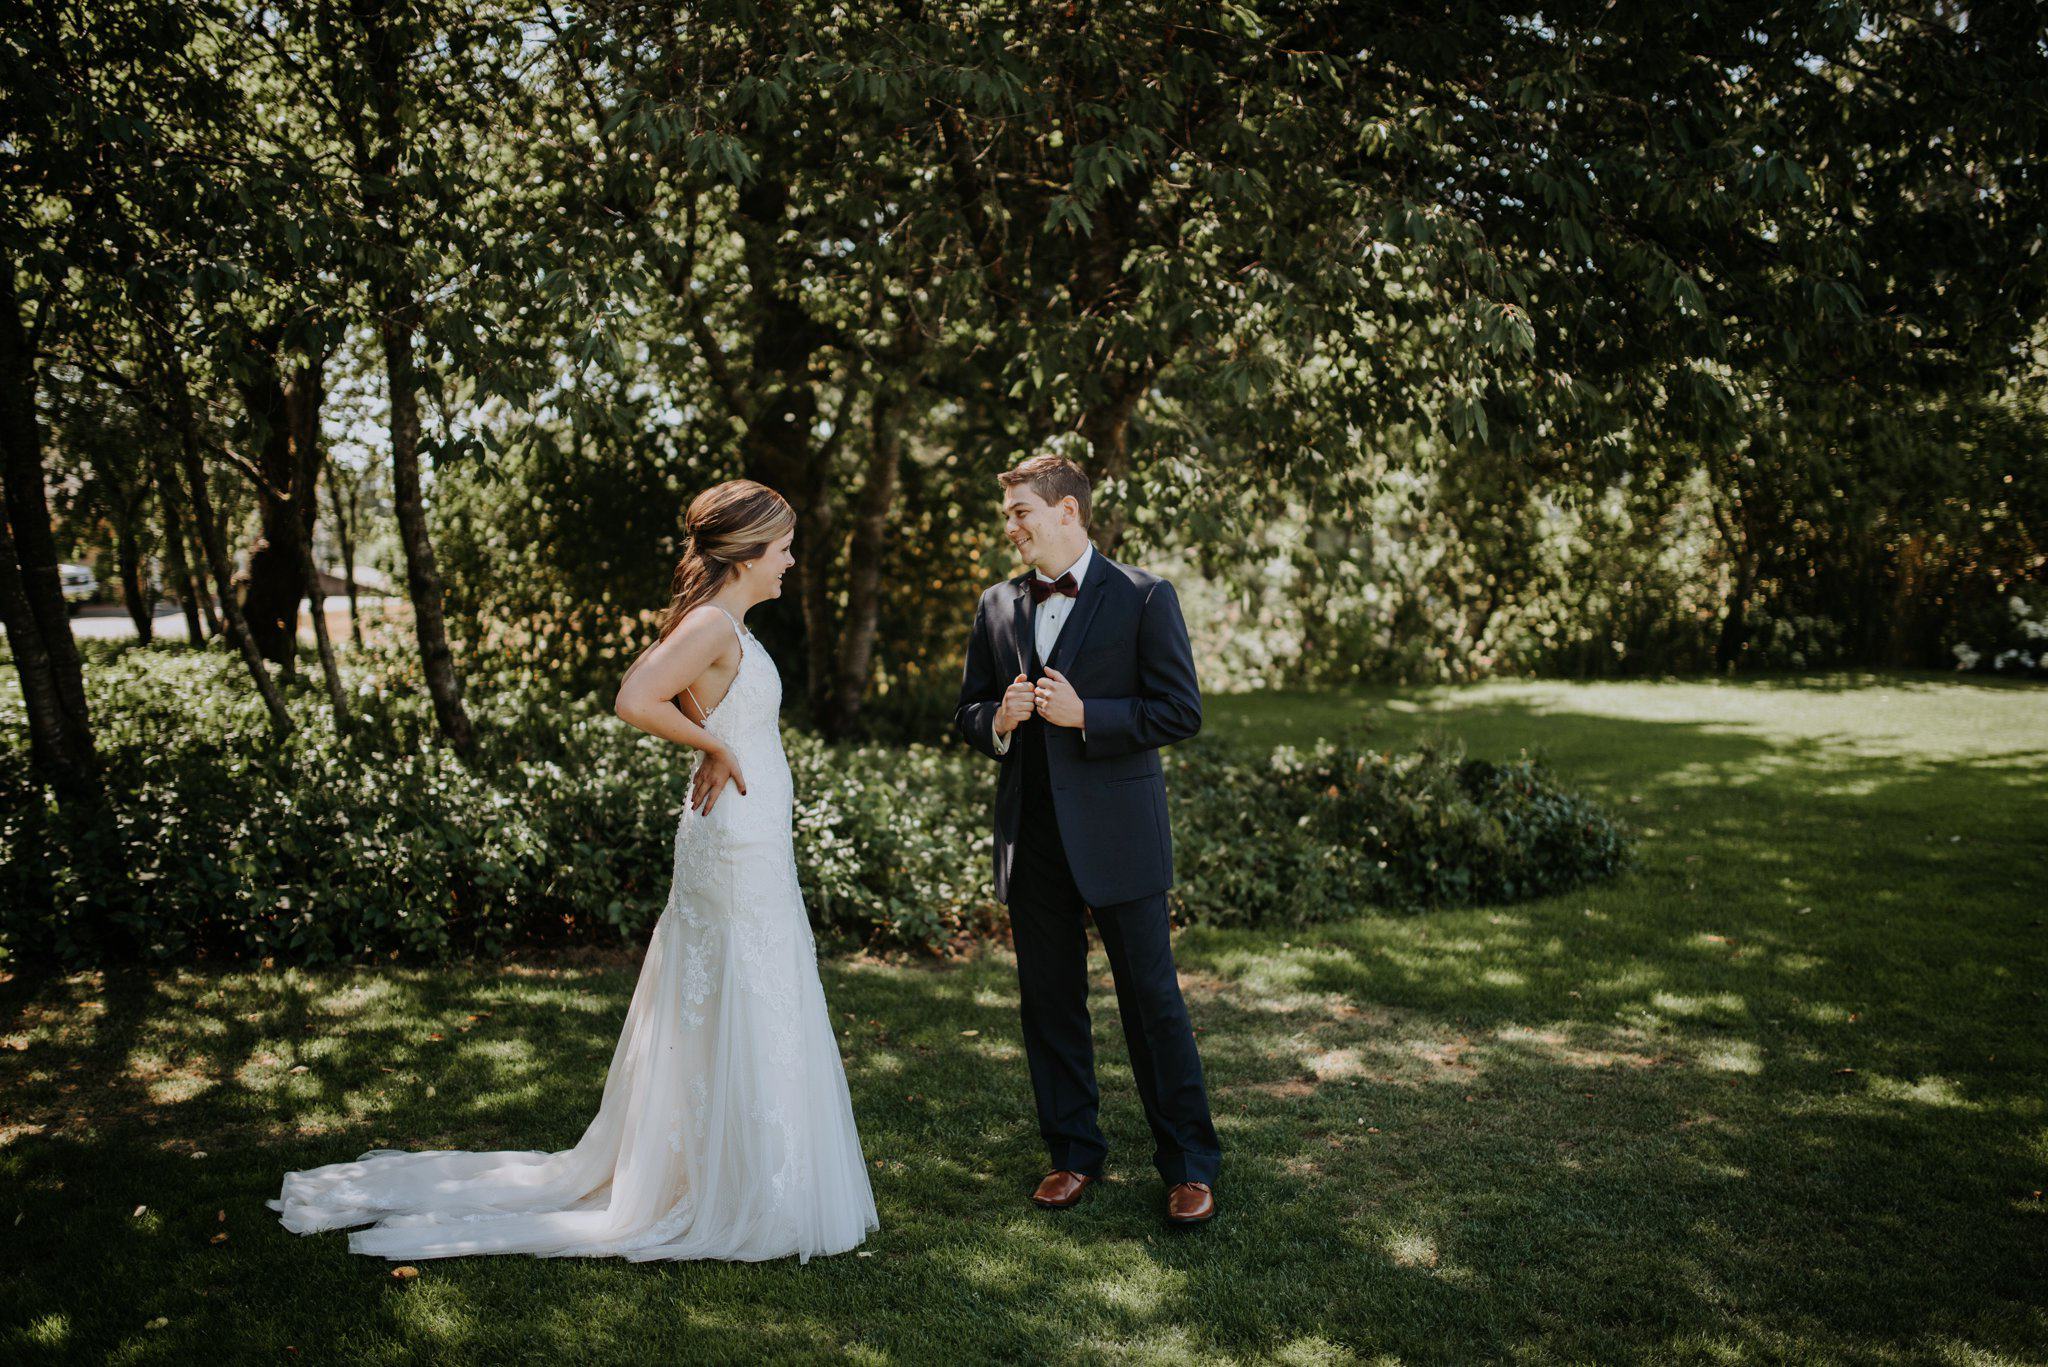 kristen-and-cody-the-kelley-farm-wedding-seattle-photographer-caitlyn-nikula-32.jpg